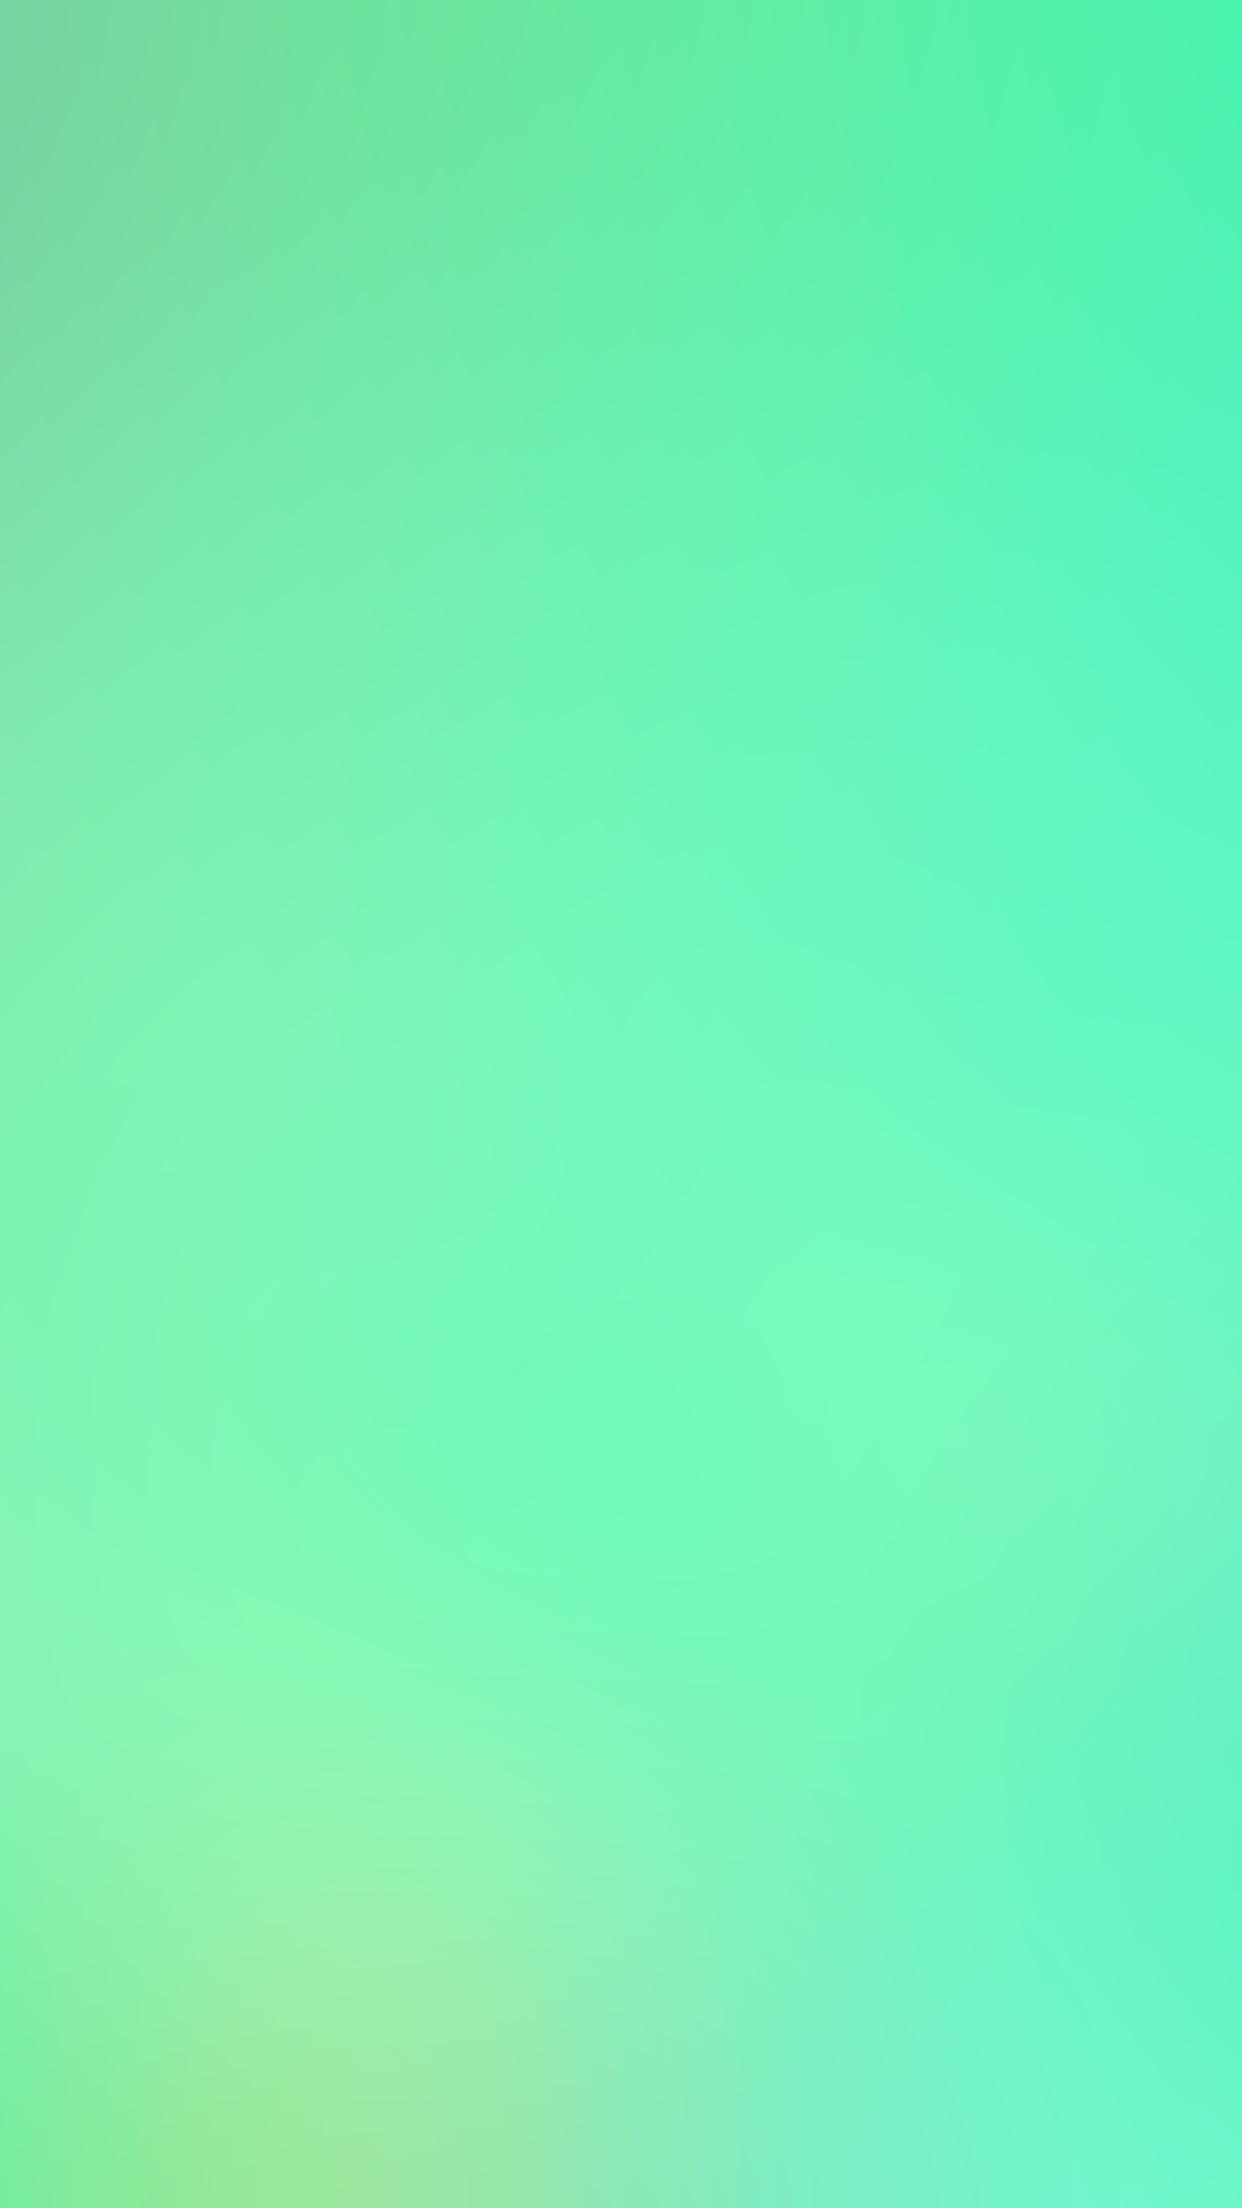 Mint Green Iphone Wallpaper 60 Images